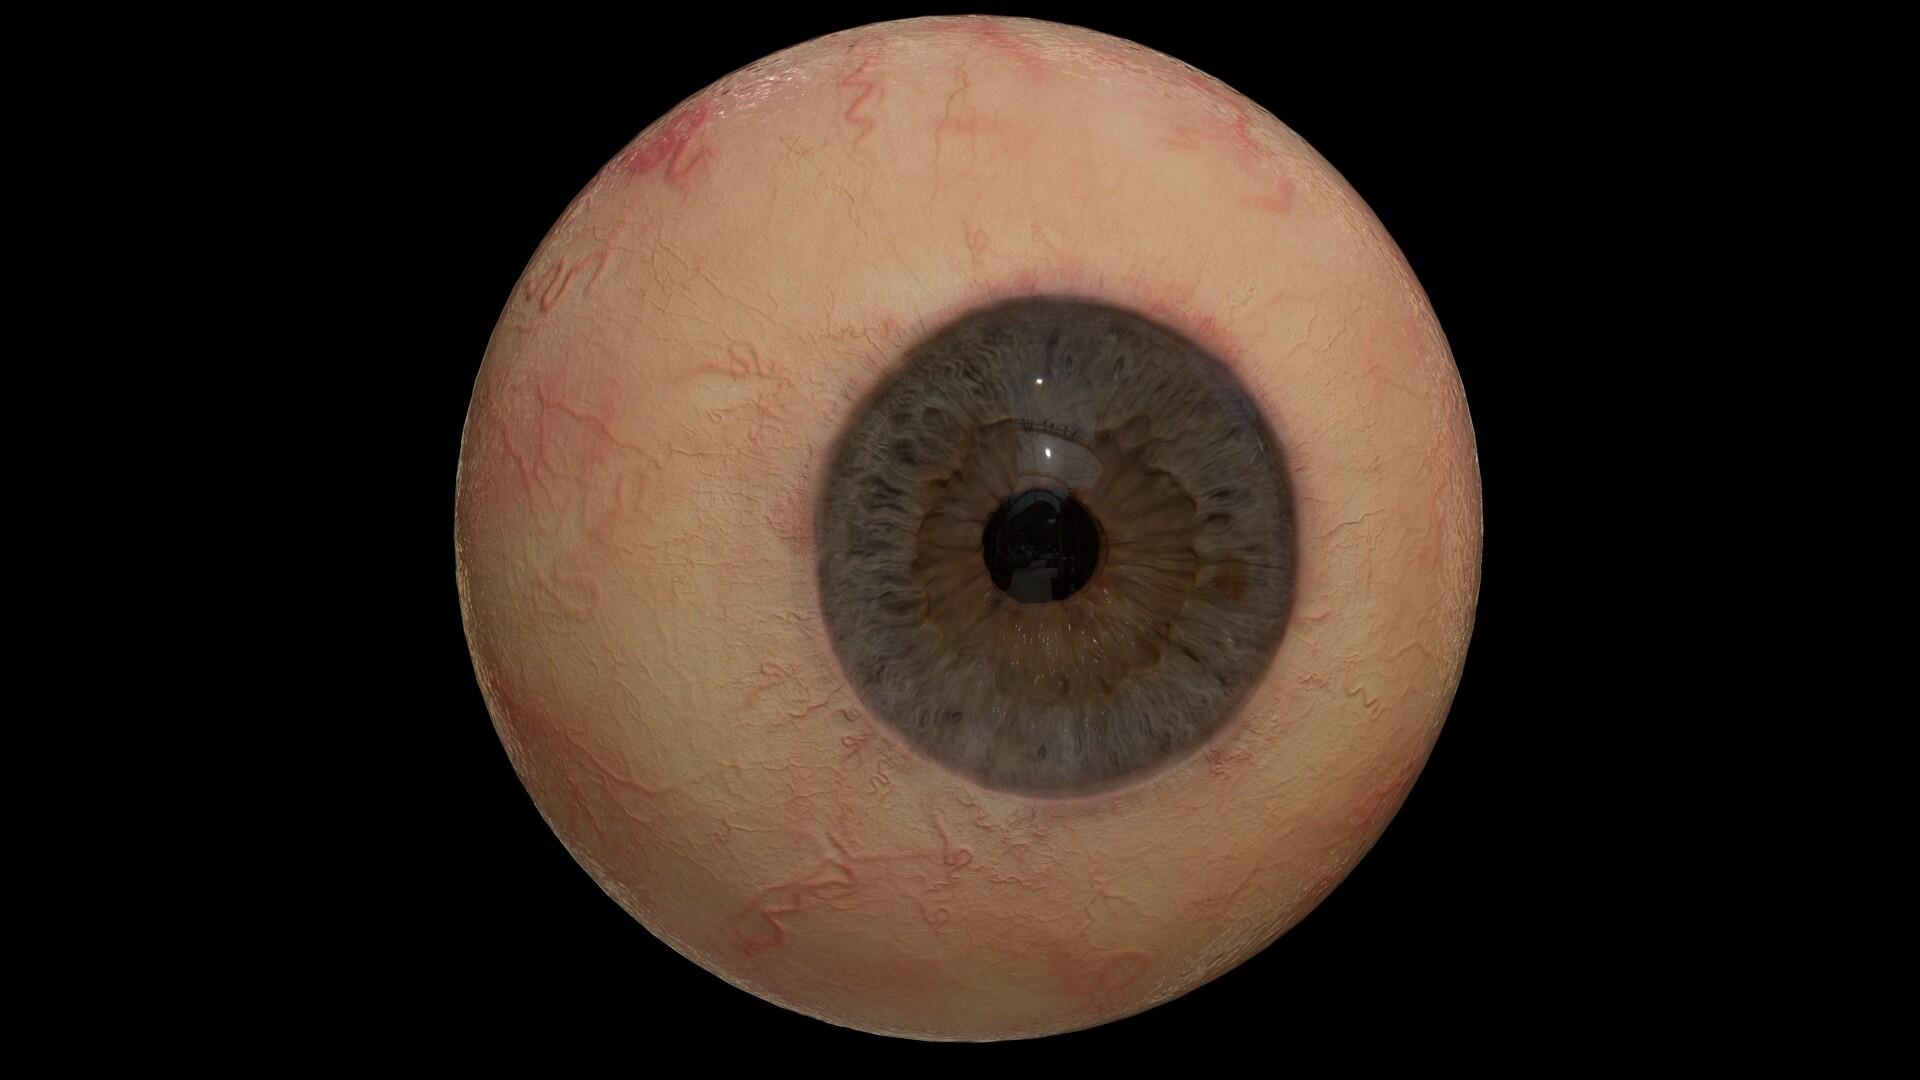 Chingiz jumagulov eye version12 001